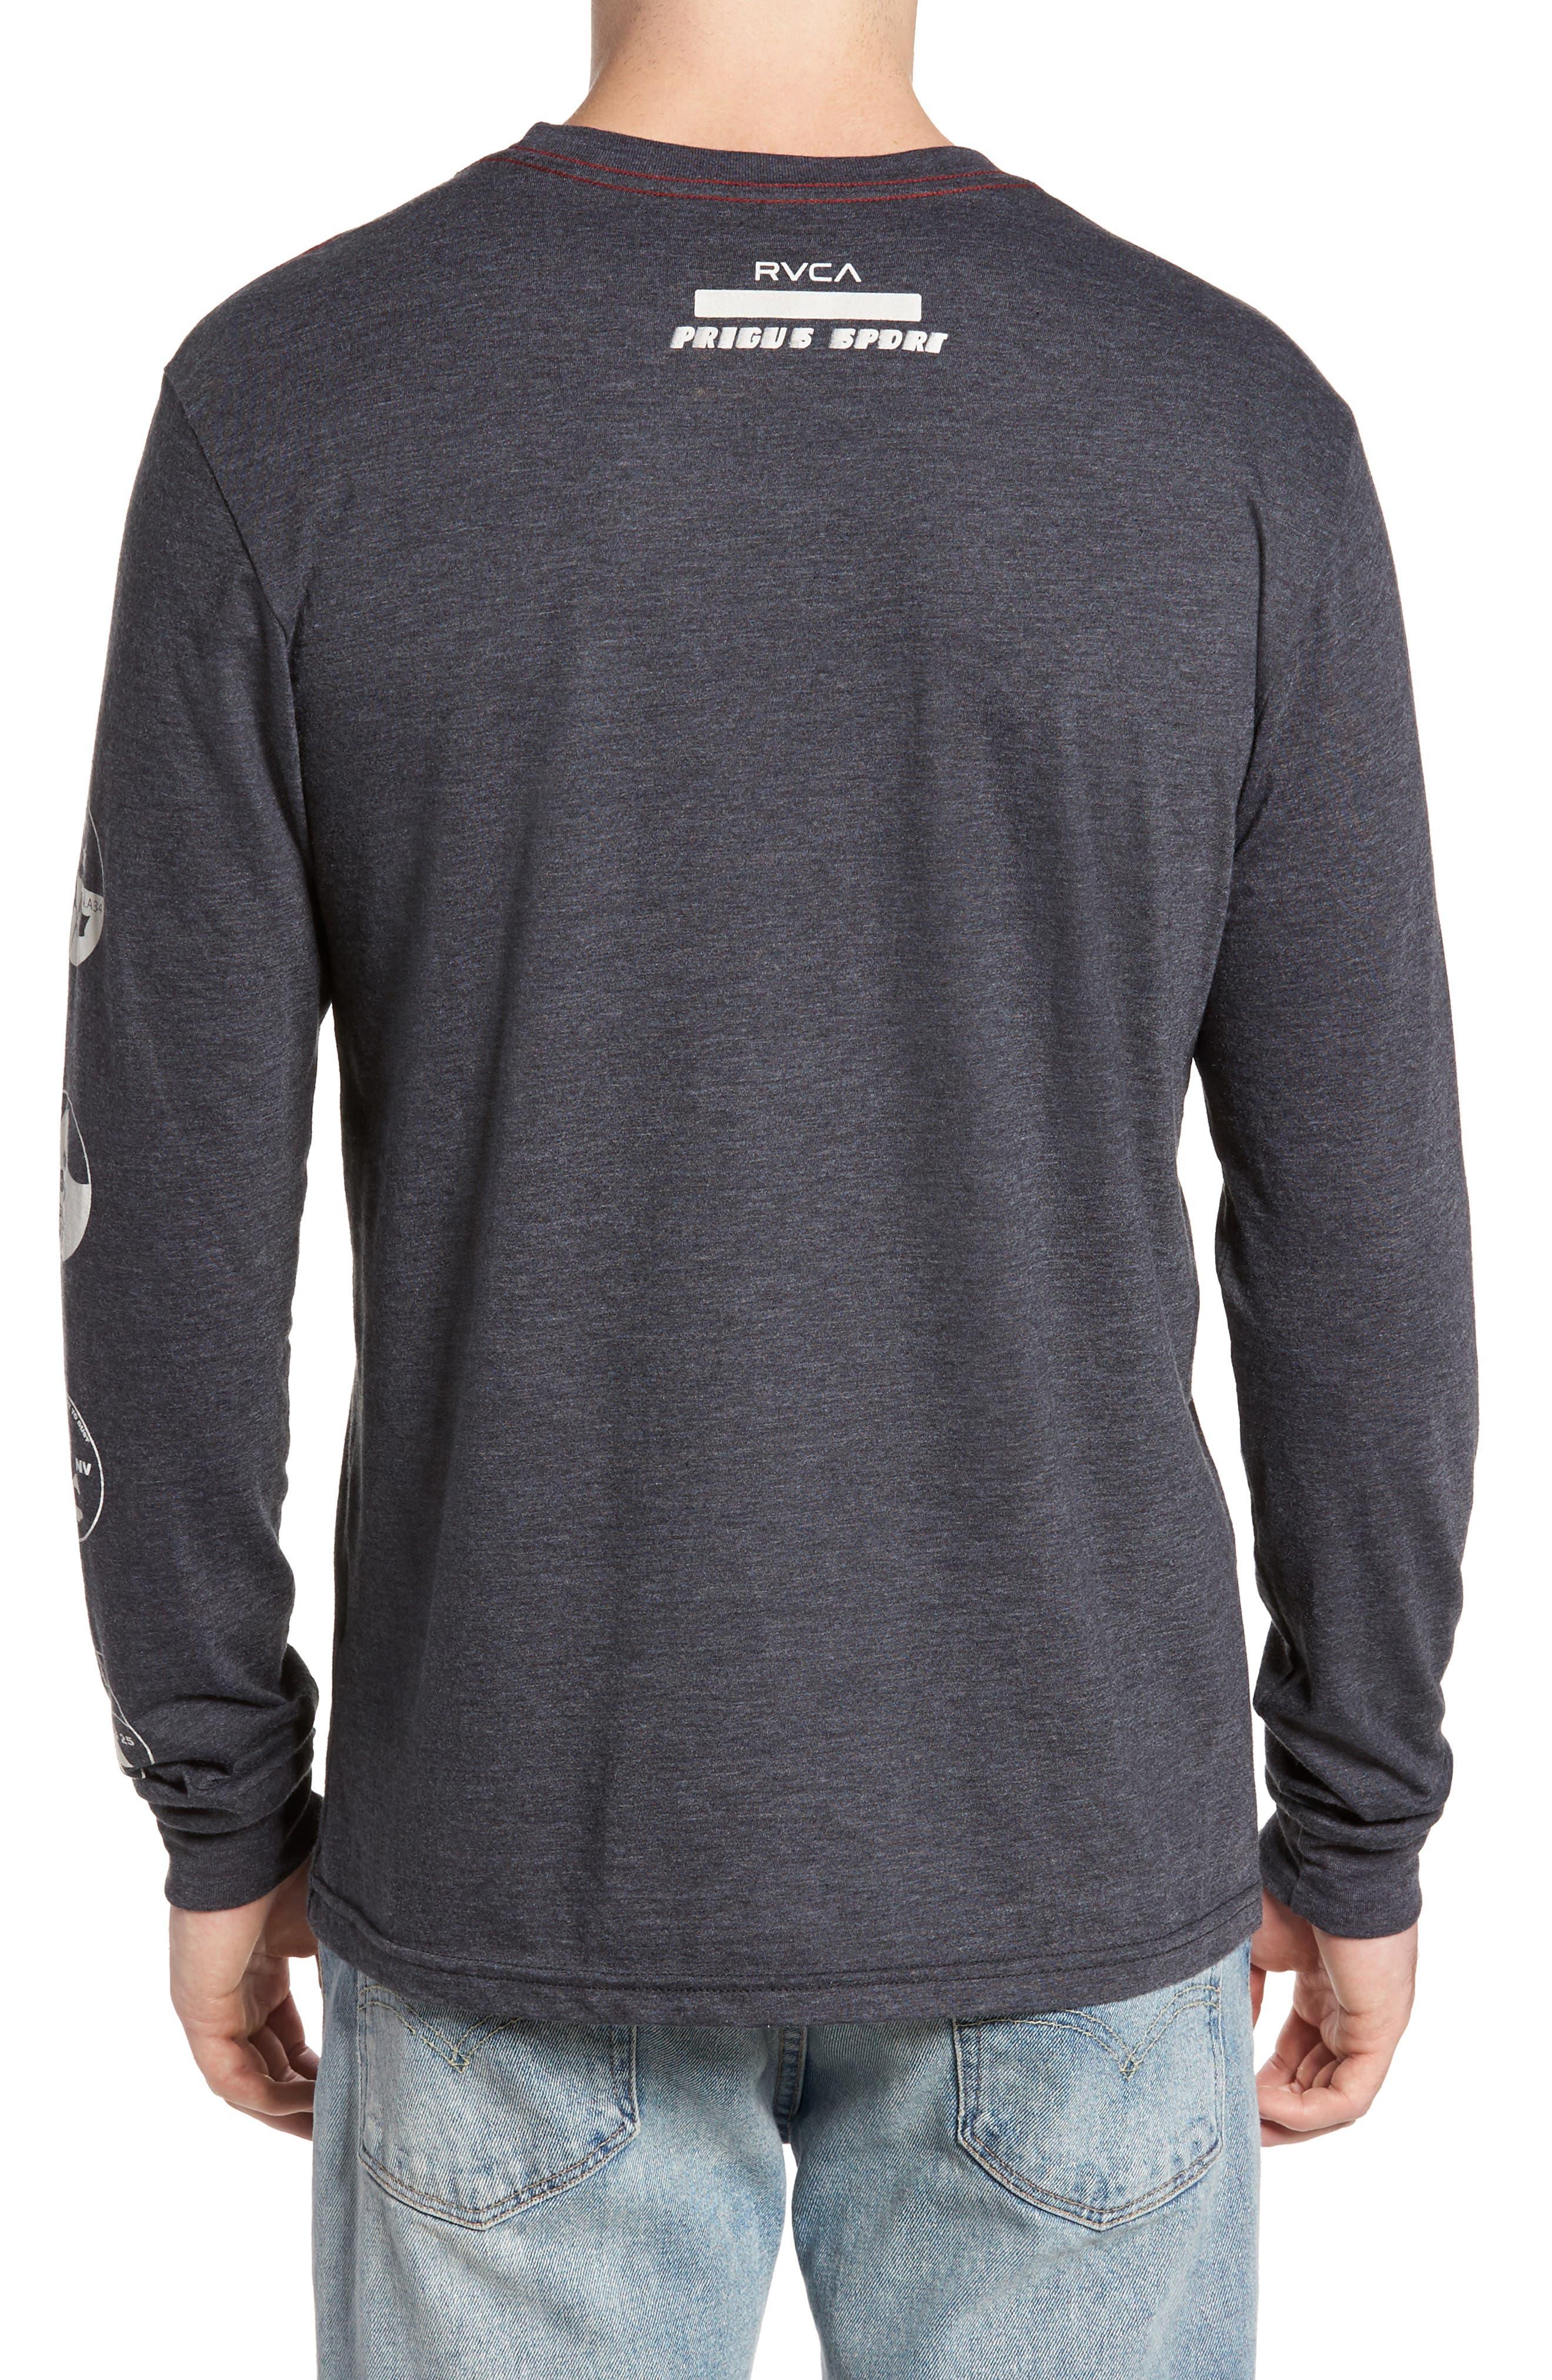 Prigus Sport Team T-Shirt,                             Alternate thumbnail 2, color,                             001